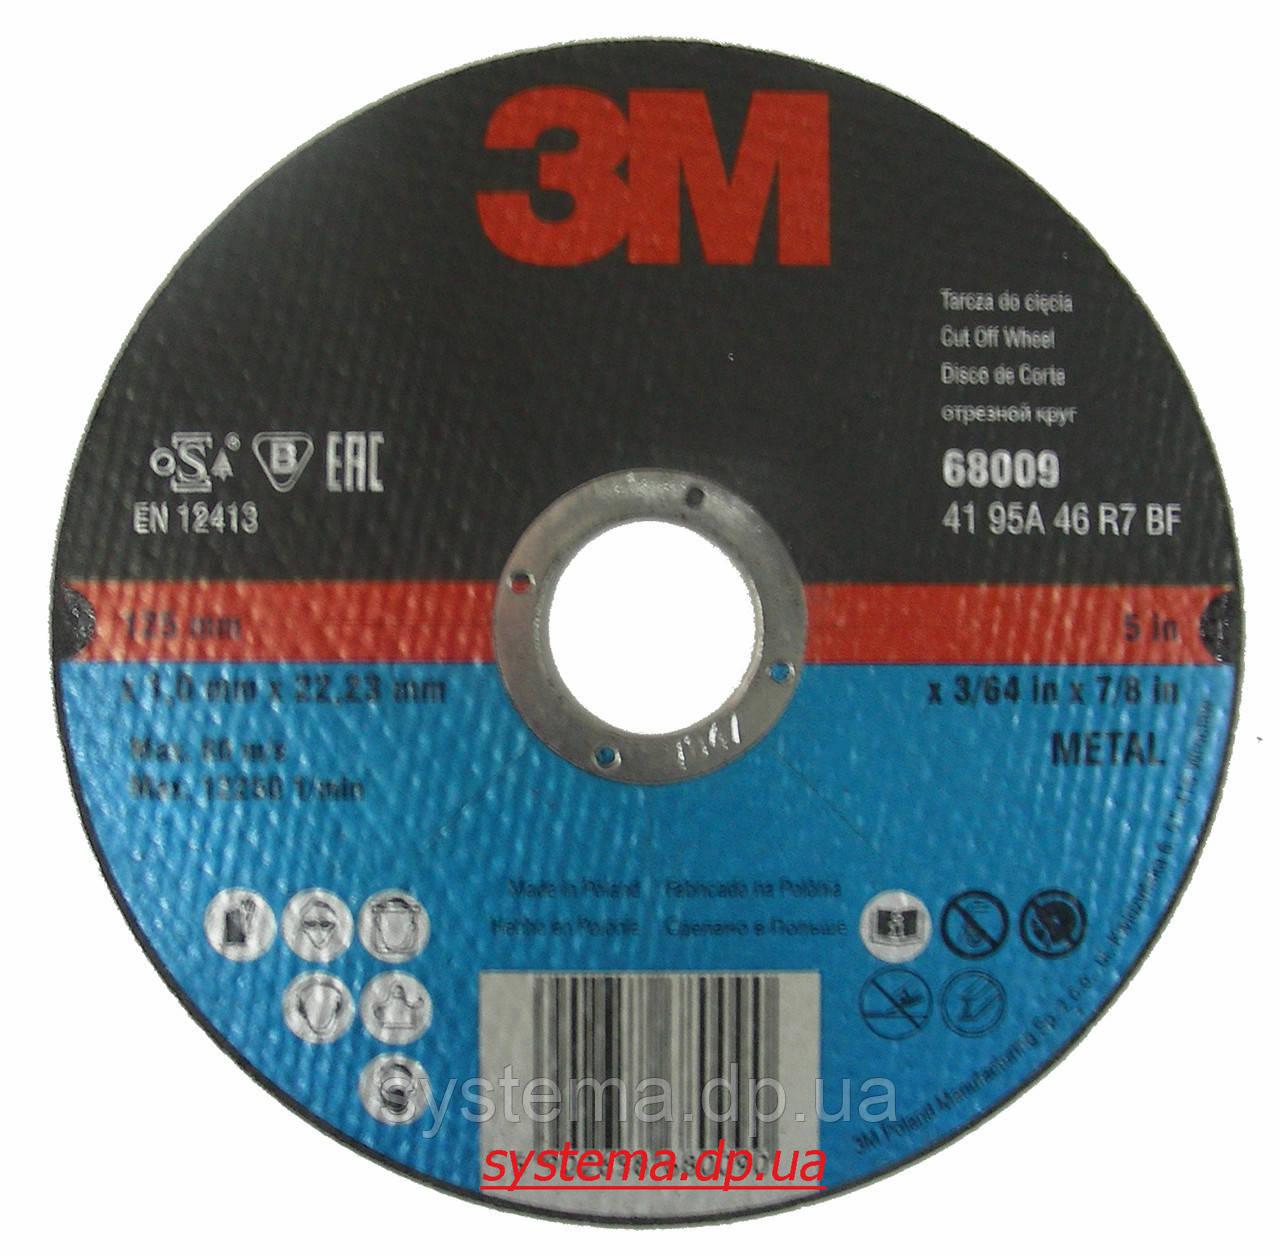 3M™ 60830 - Отрезной круг, прямой, по металлу T41, 125х22,23х1,6 мм